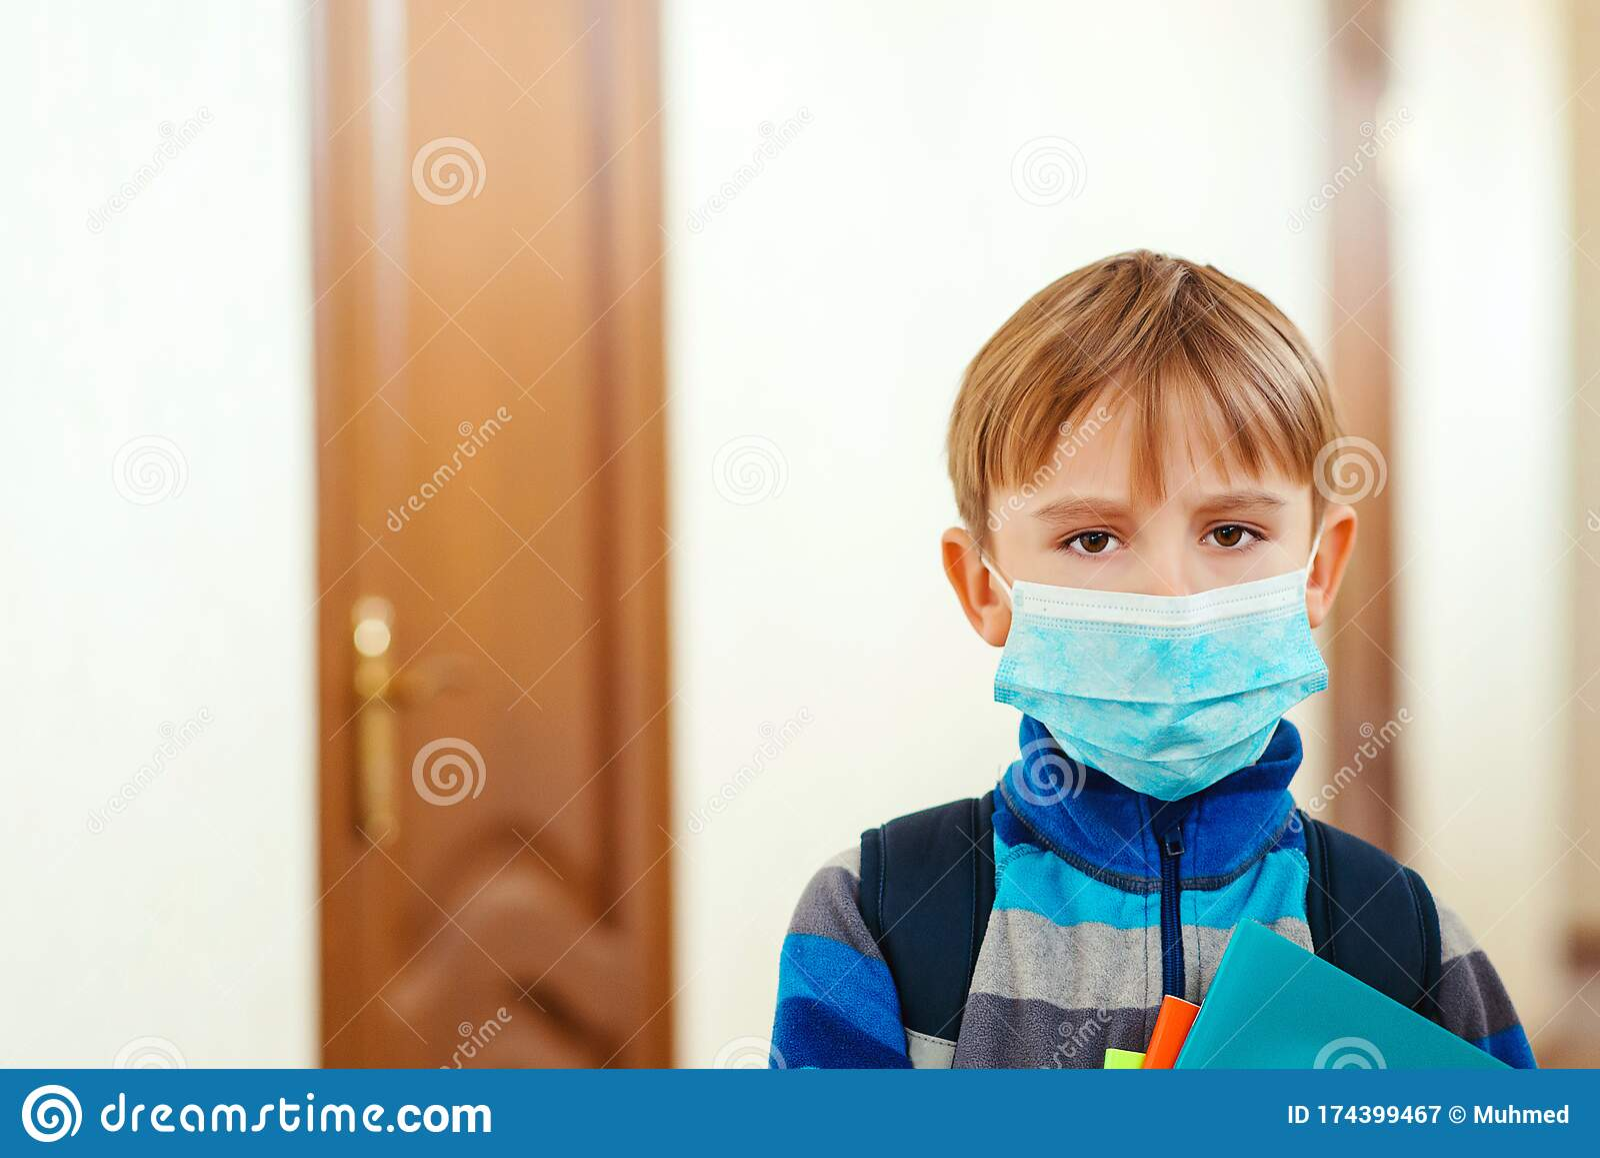 child mask virus